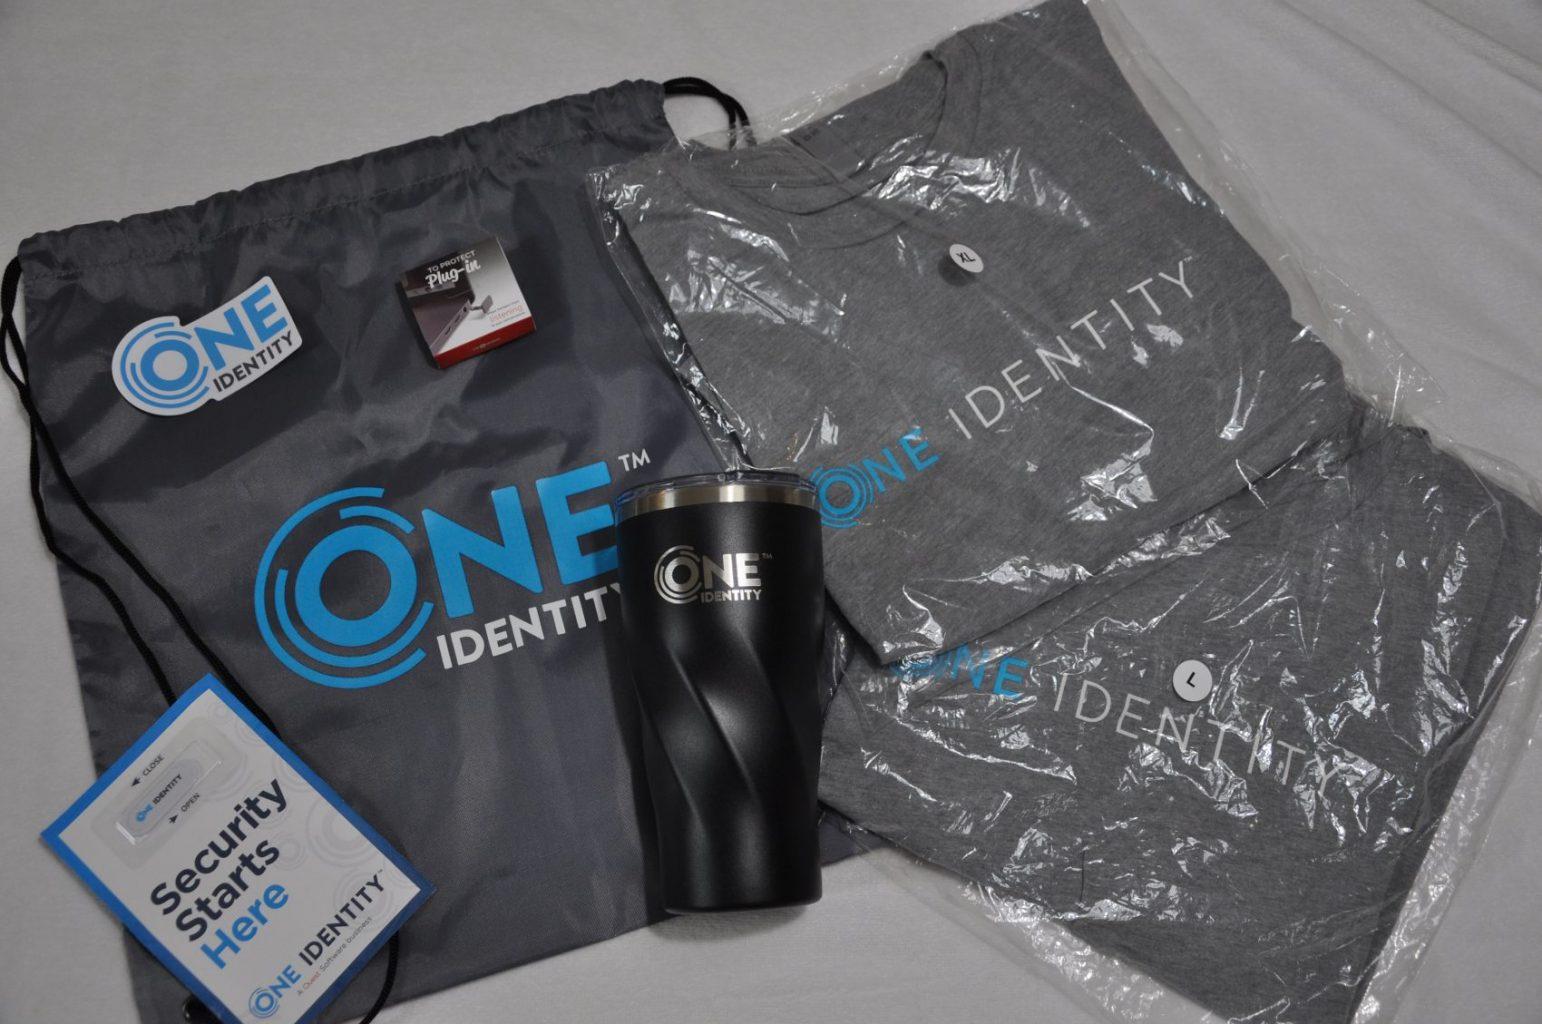 One Identity Gift Packs